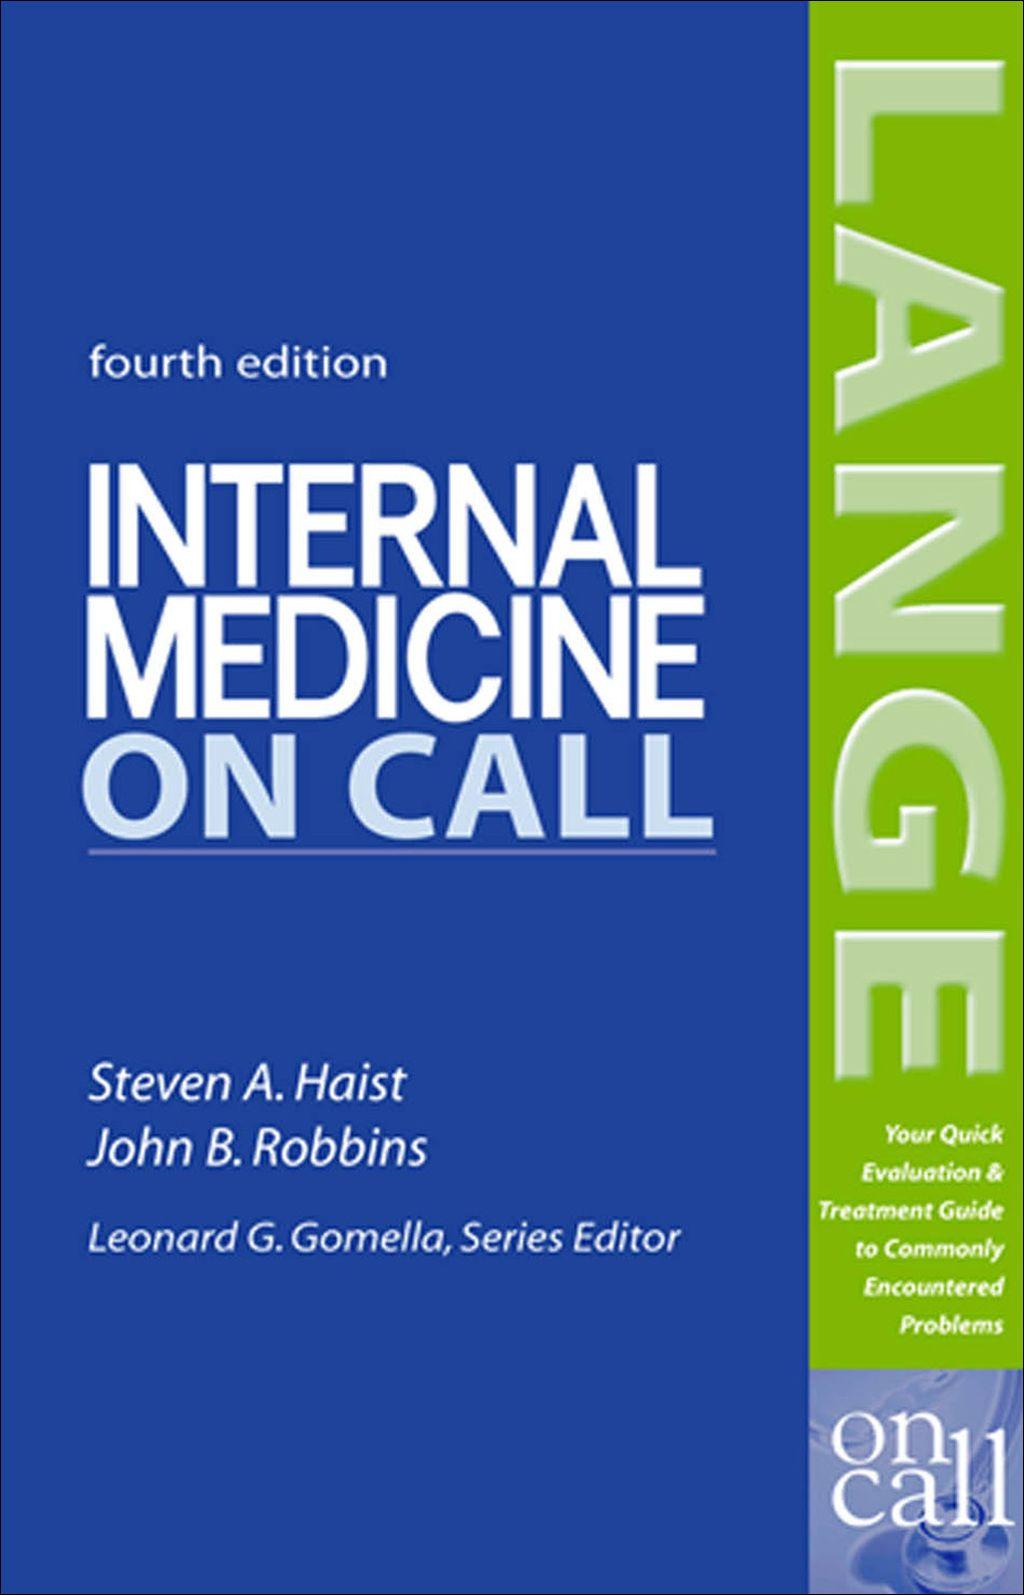 Internal medicine on call ebook